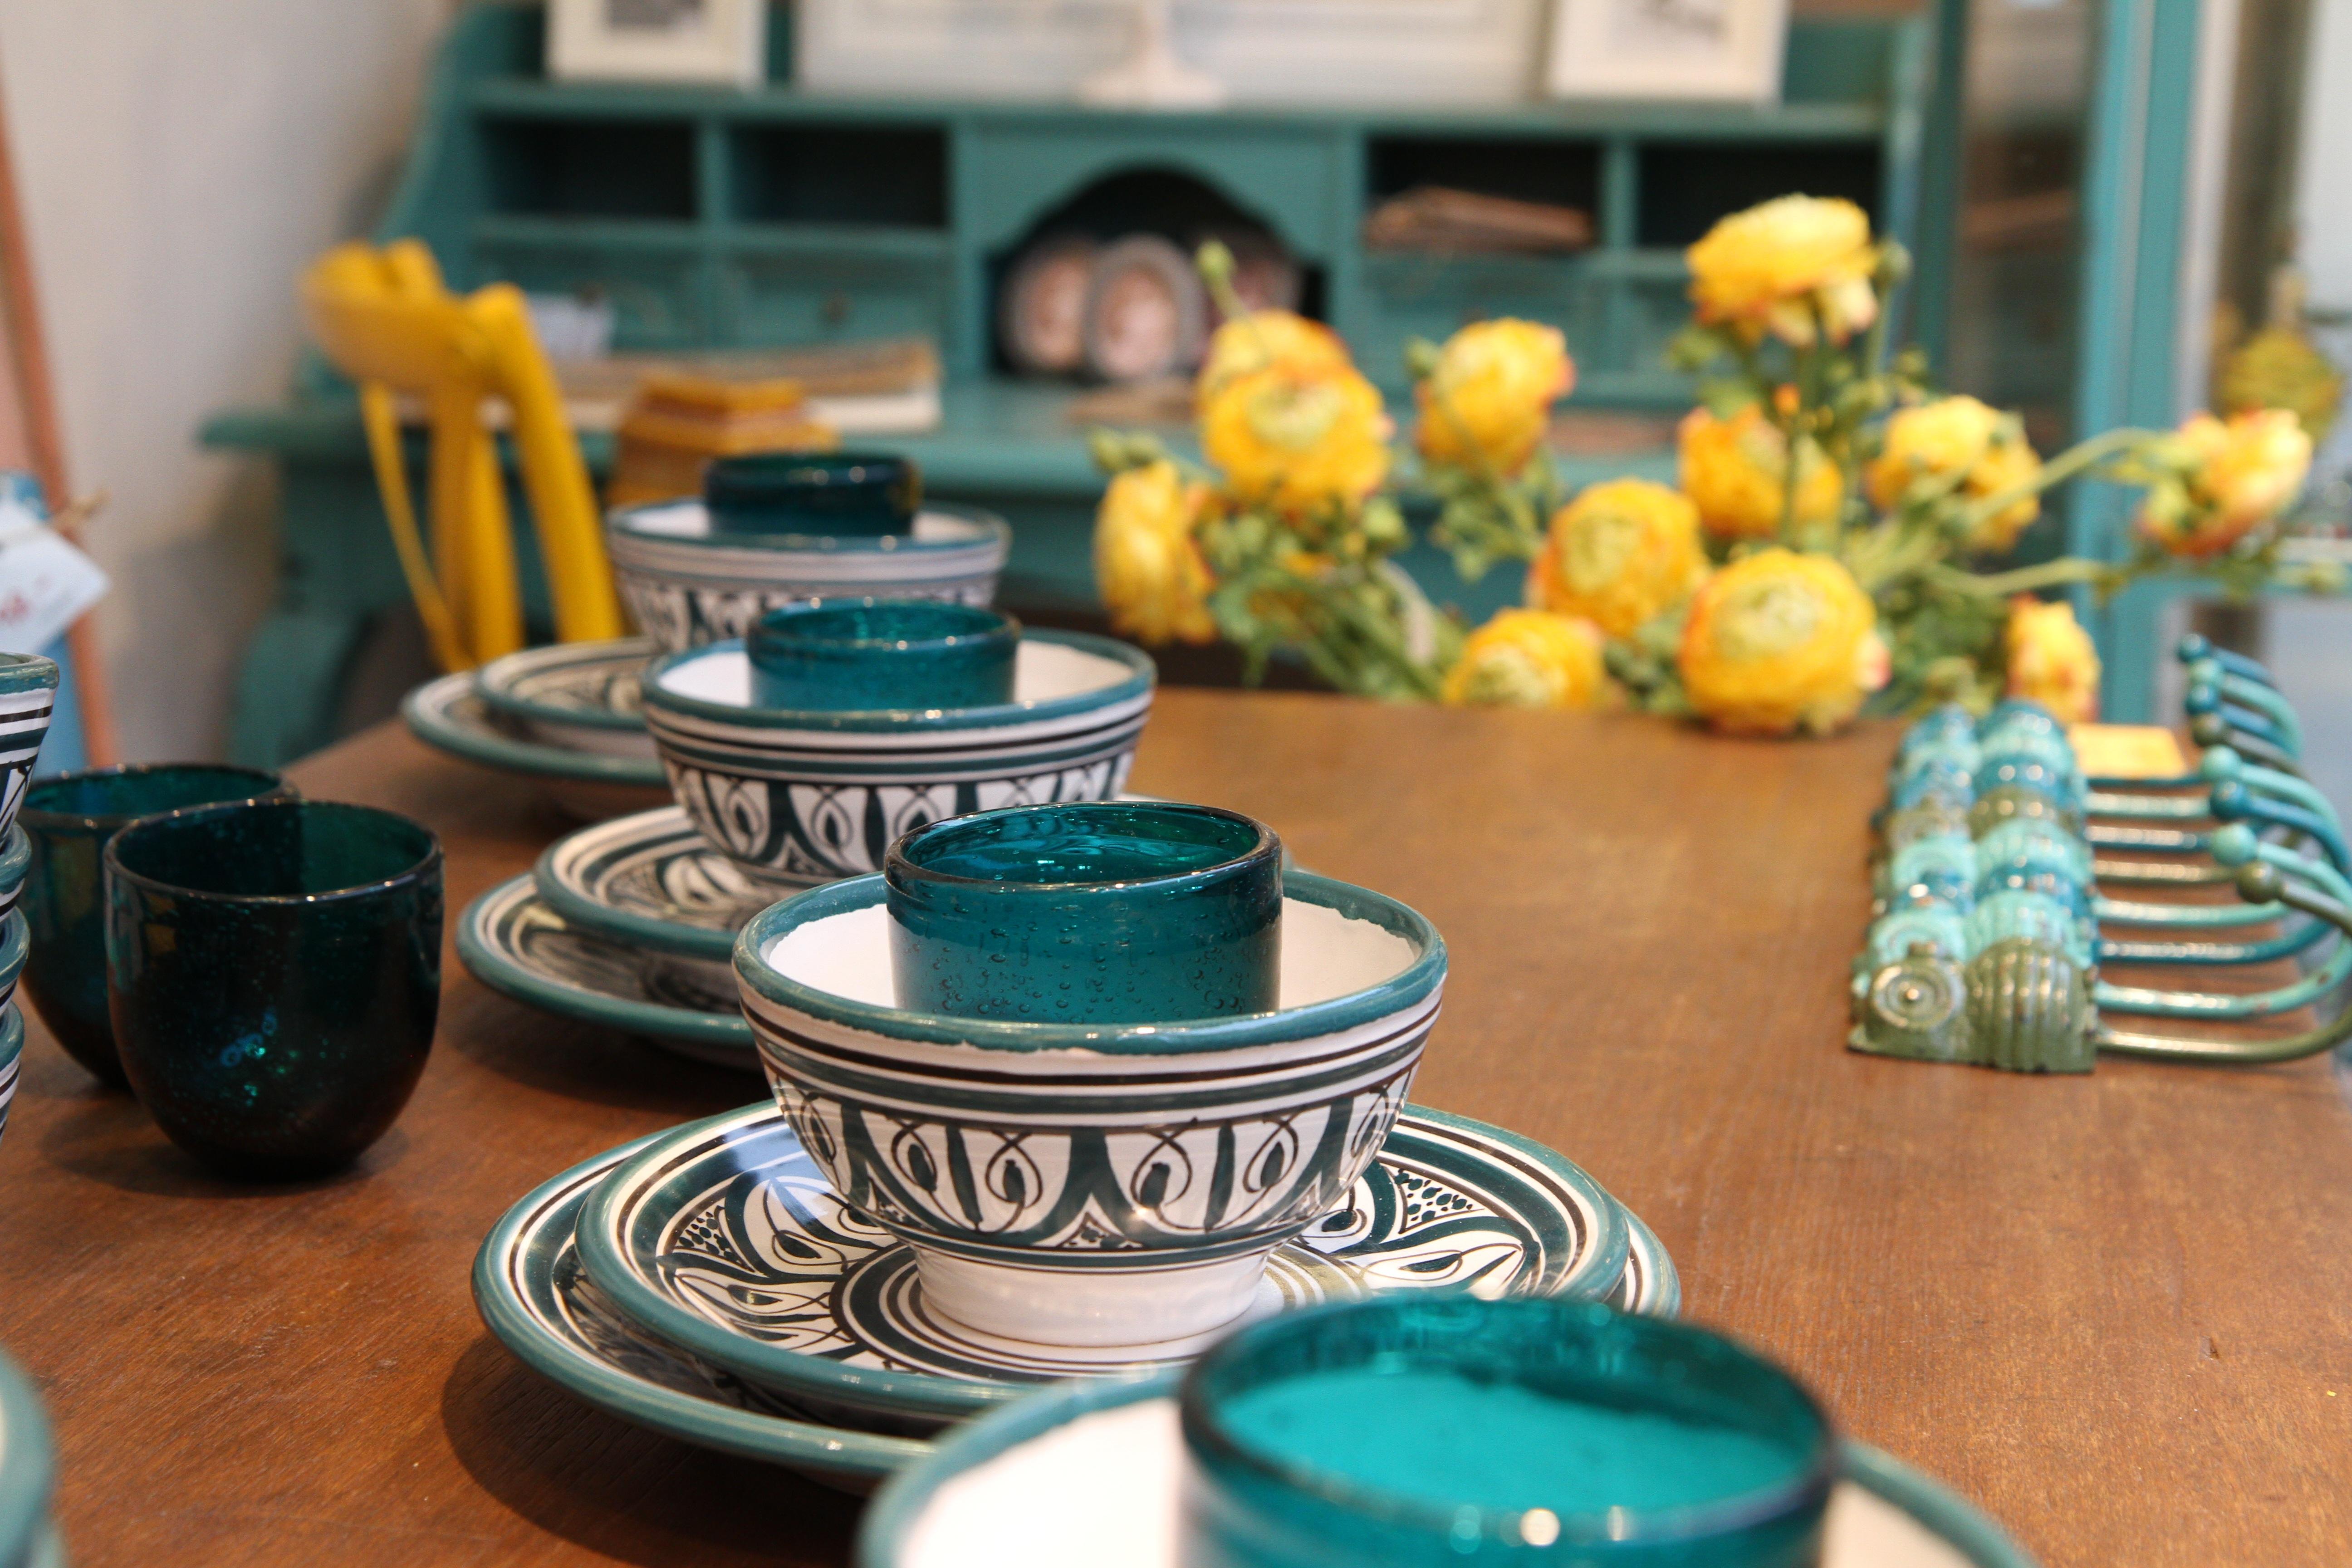 decoration bowl green color ceramic blue lifestyle flowers interior design living art yellow flowers & Free Images : decoration bowl green color ceramic blue ...